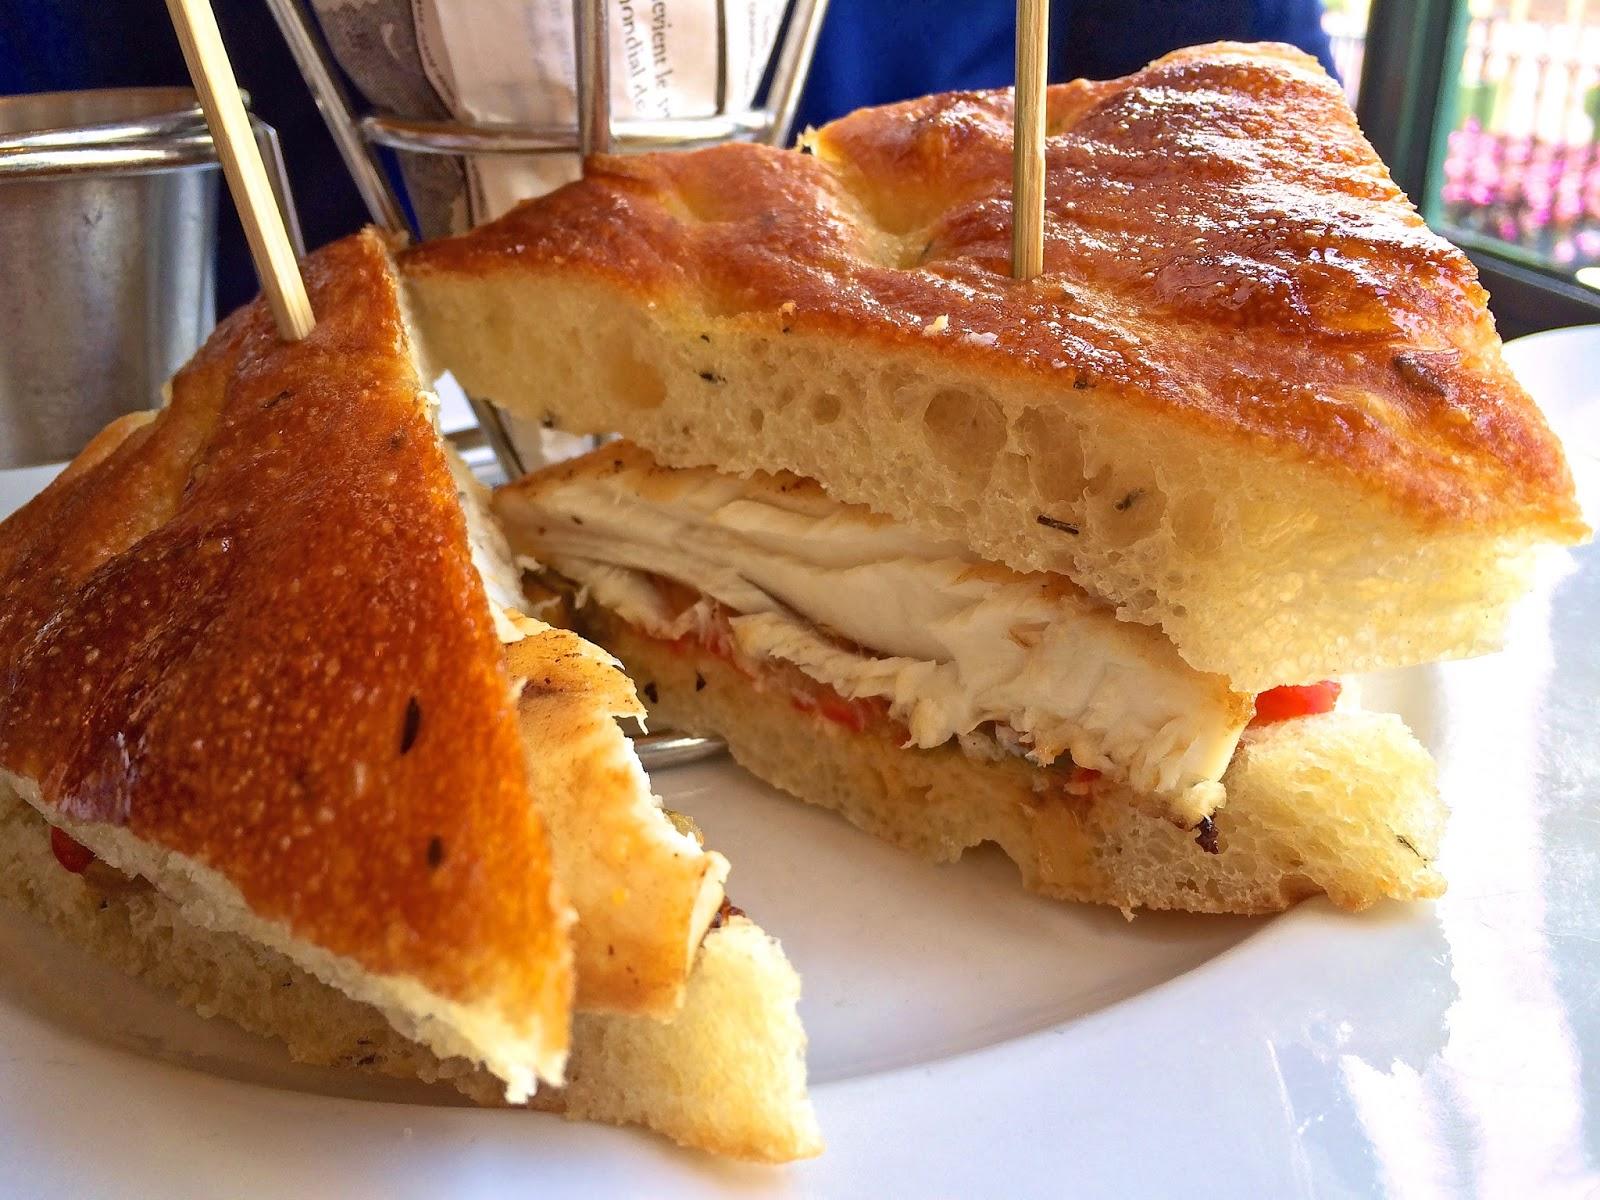 Mahi-Mahi sandwich - Les Chefs De France - Epcot - Walt Disney World